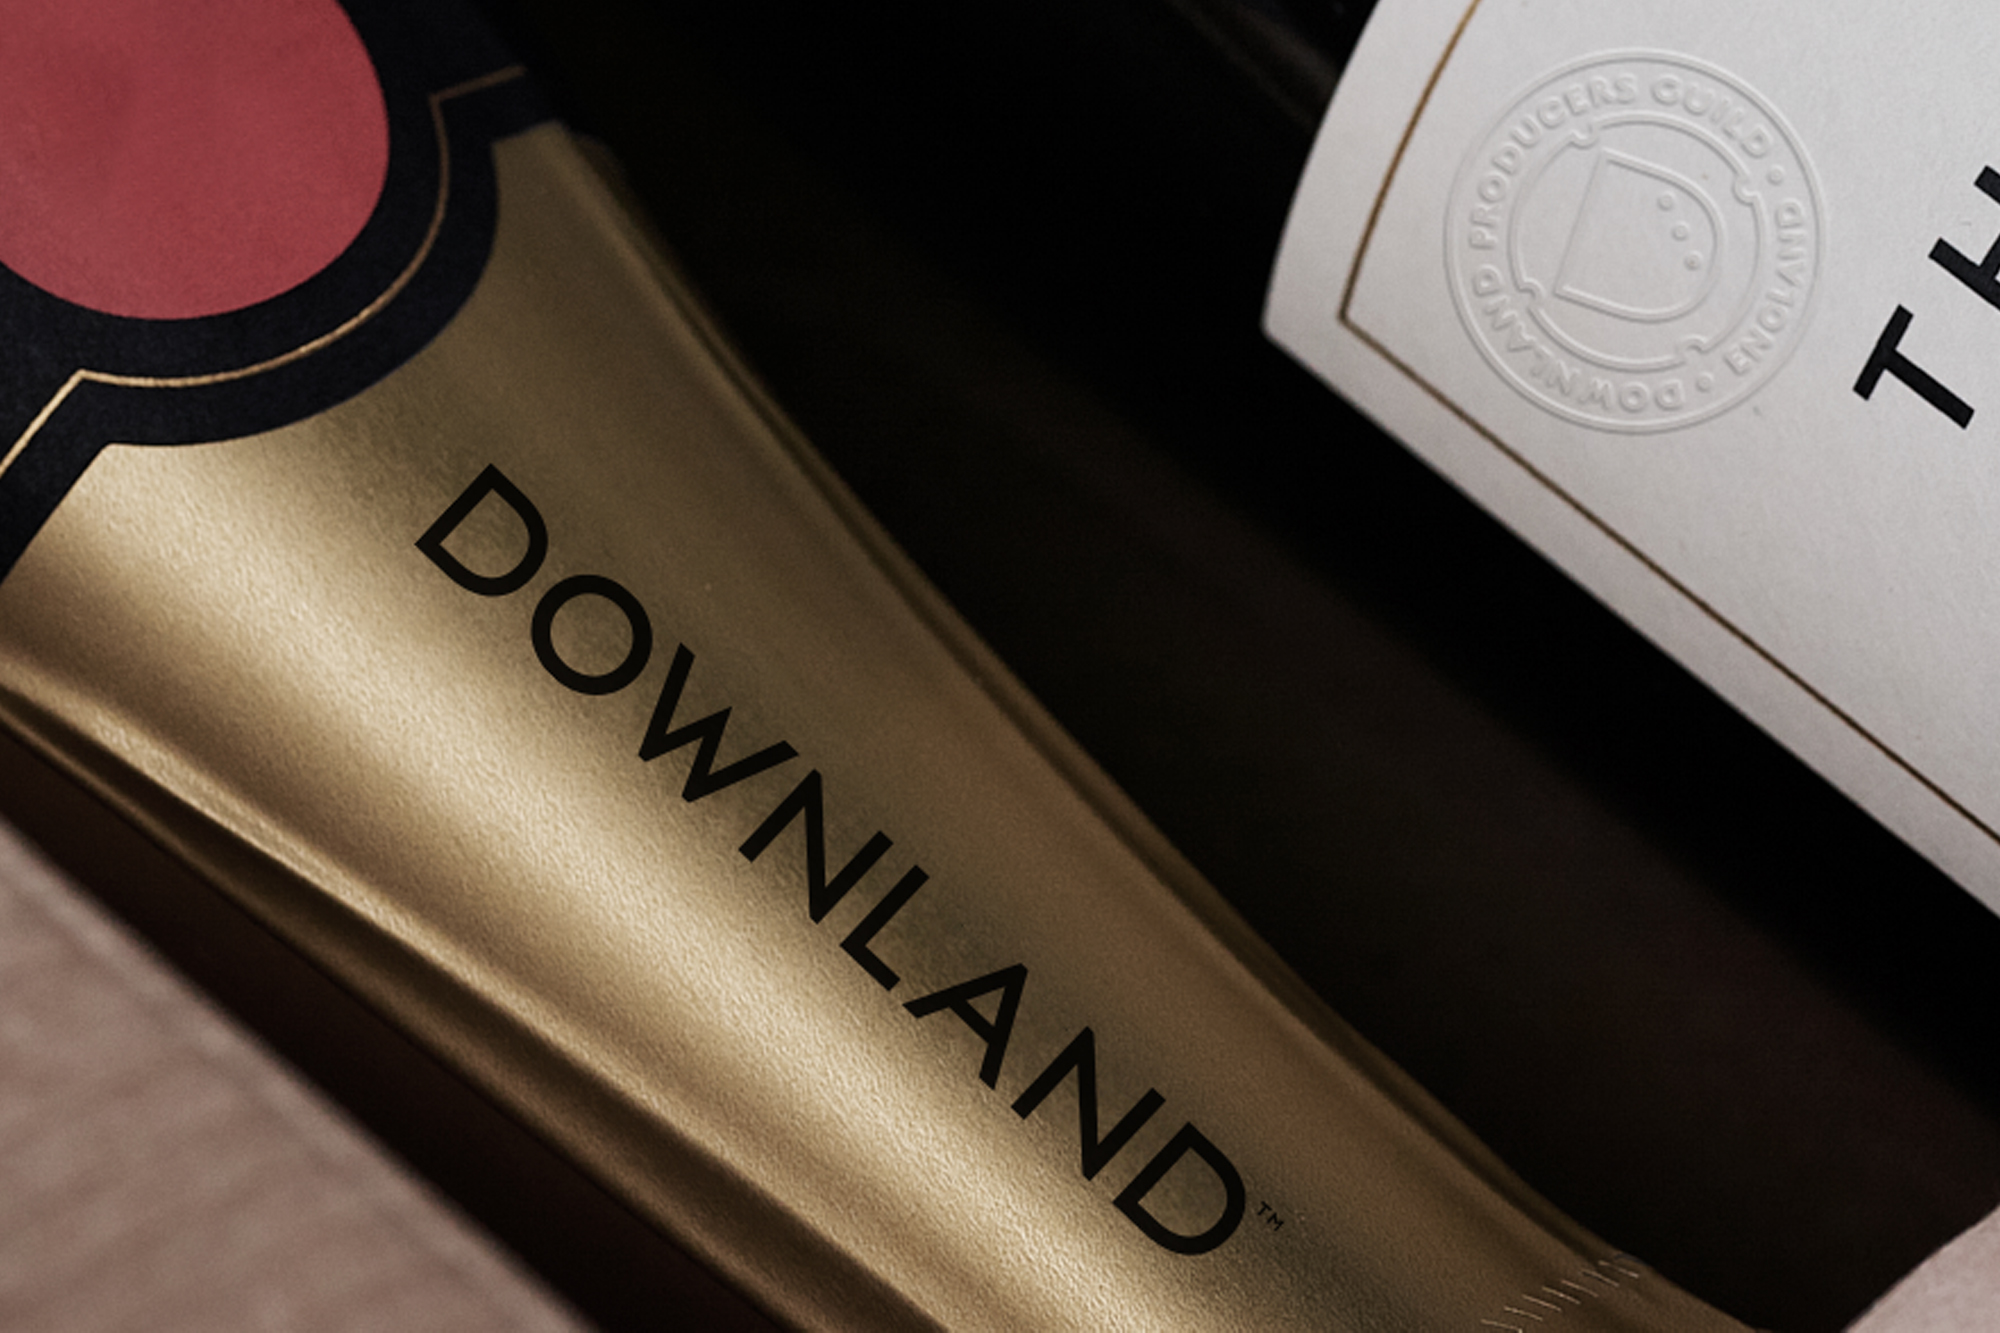 Downland_CaseStudies_IMAGES_3.jpg